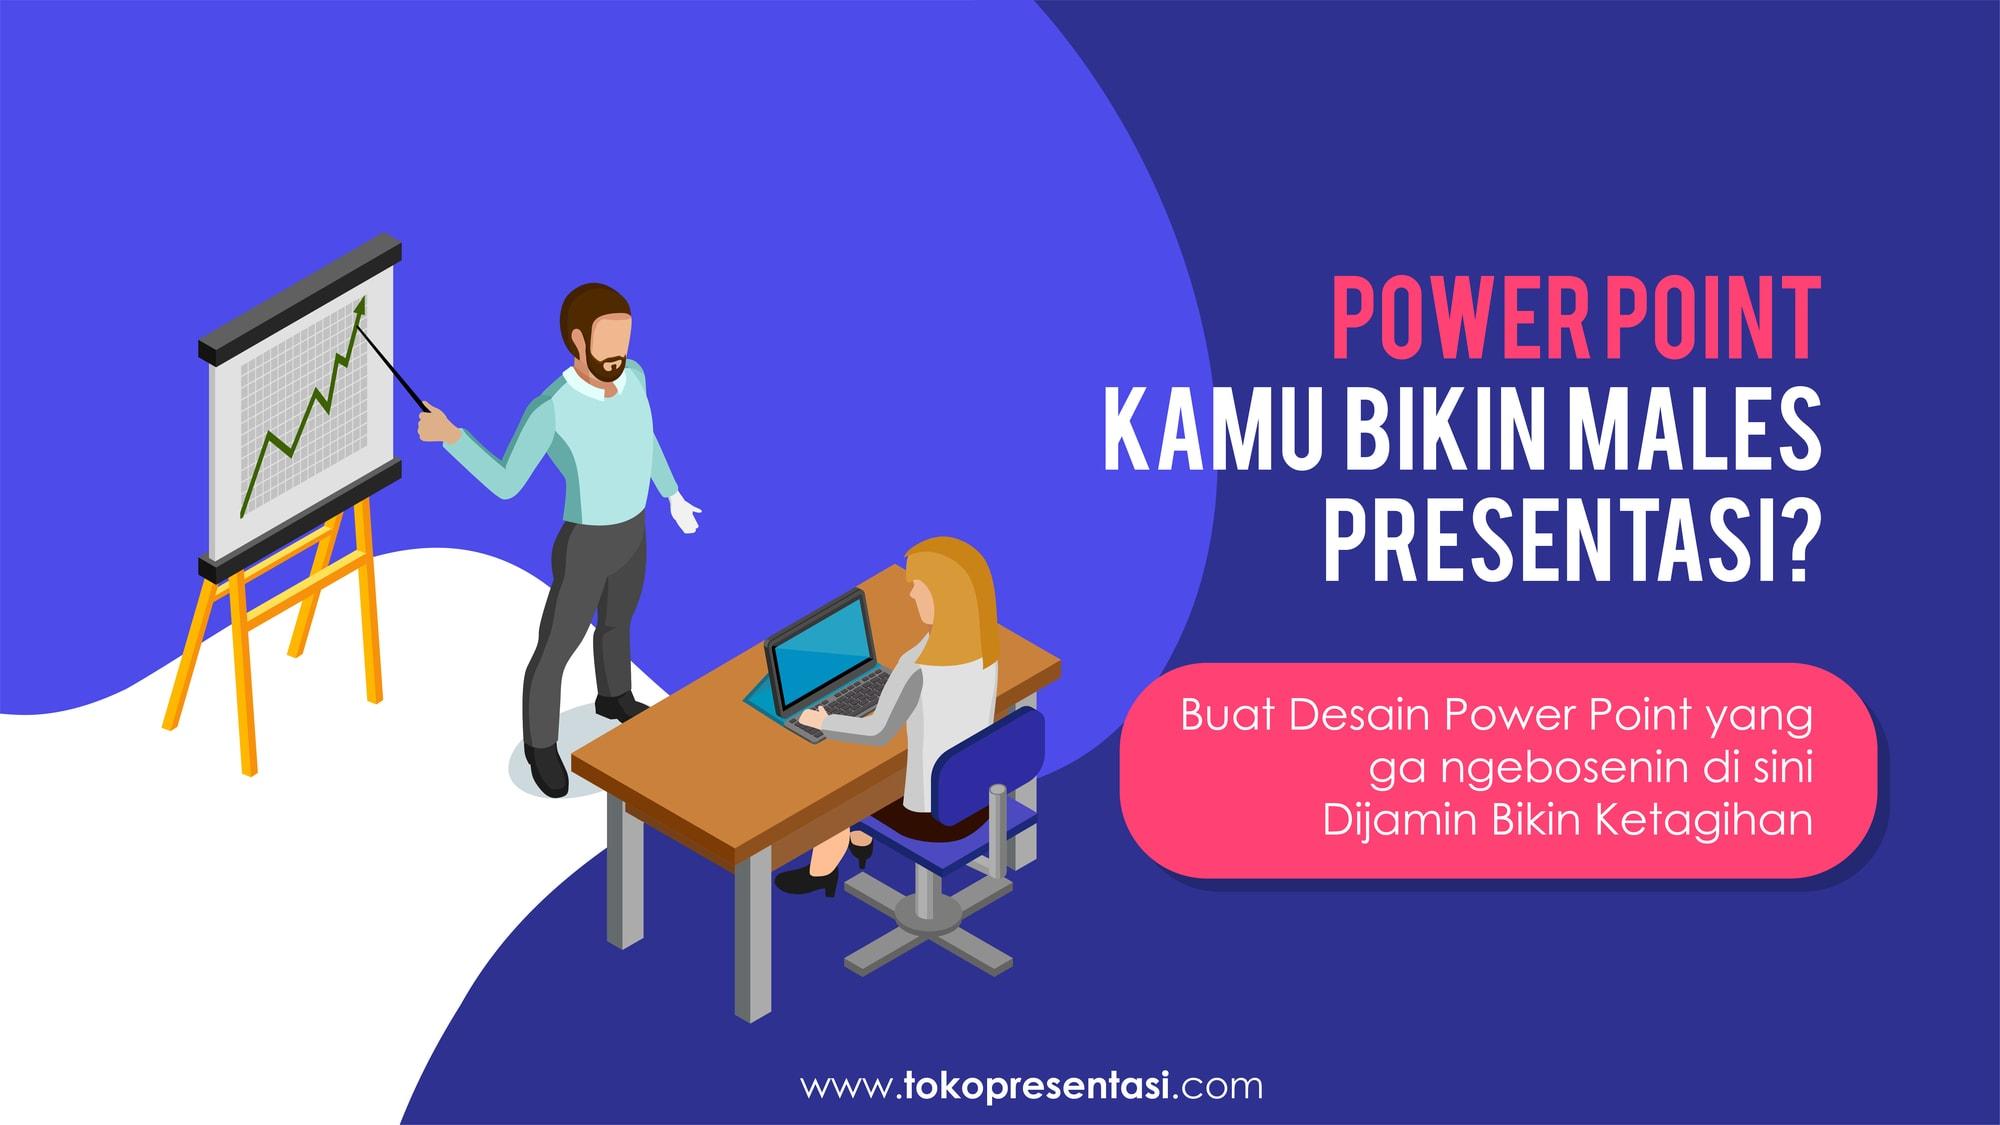 Jasa Pembuatan Desain Presentasi Powerpoint Lomba Inovasi GKM WKM TKMPN Tri Usaha Mitra Rahardja (Garuda Food) Tokopresentasi